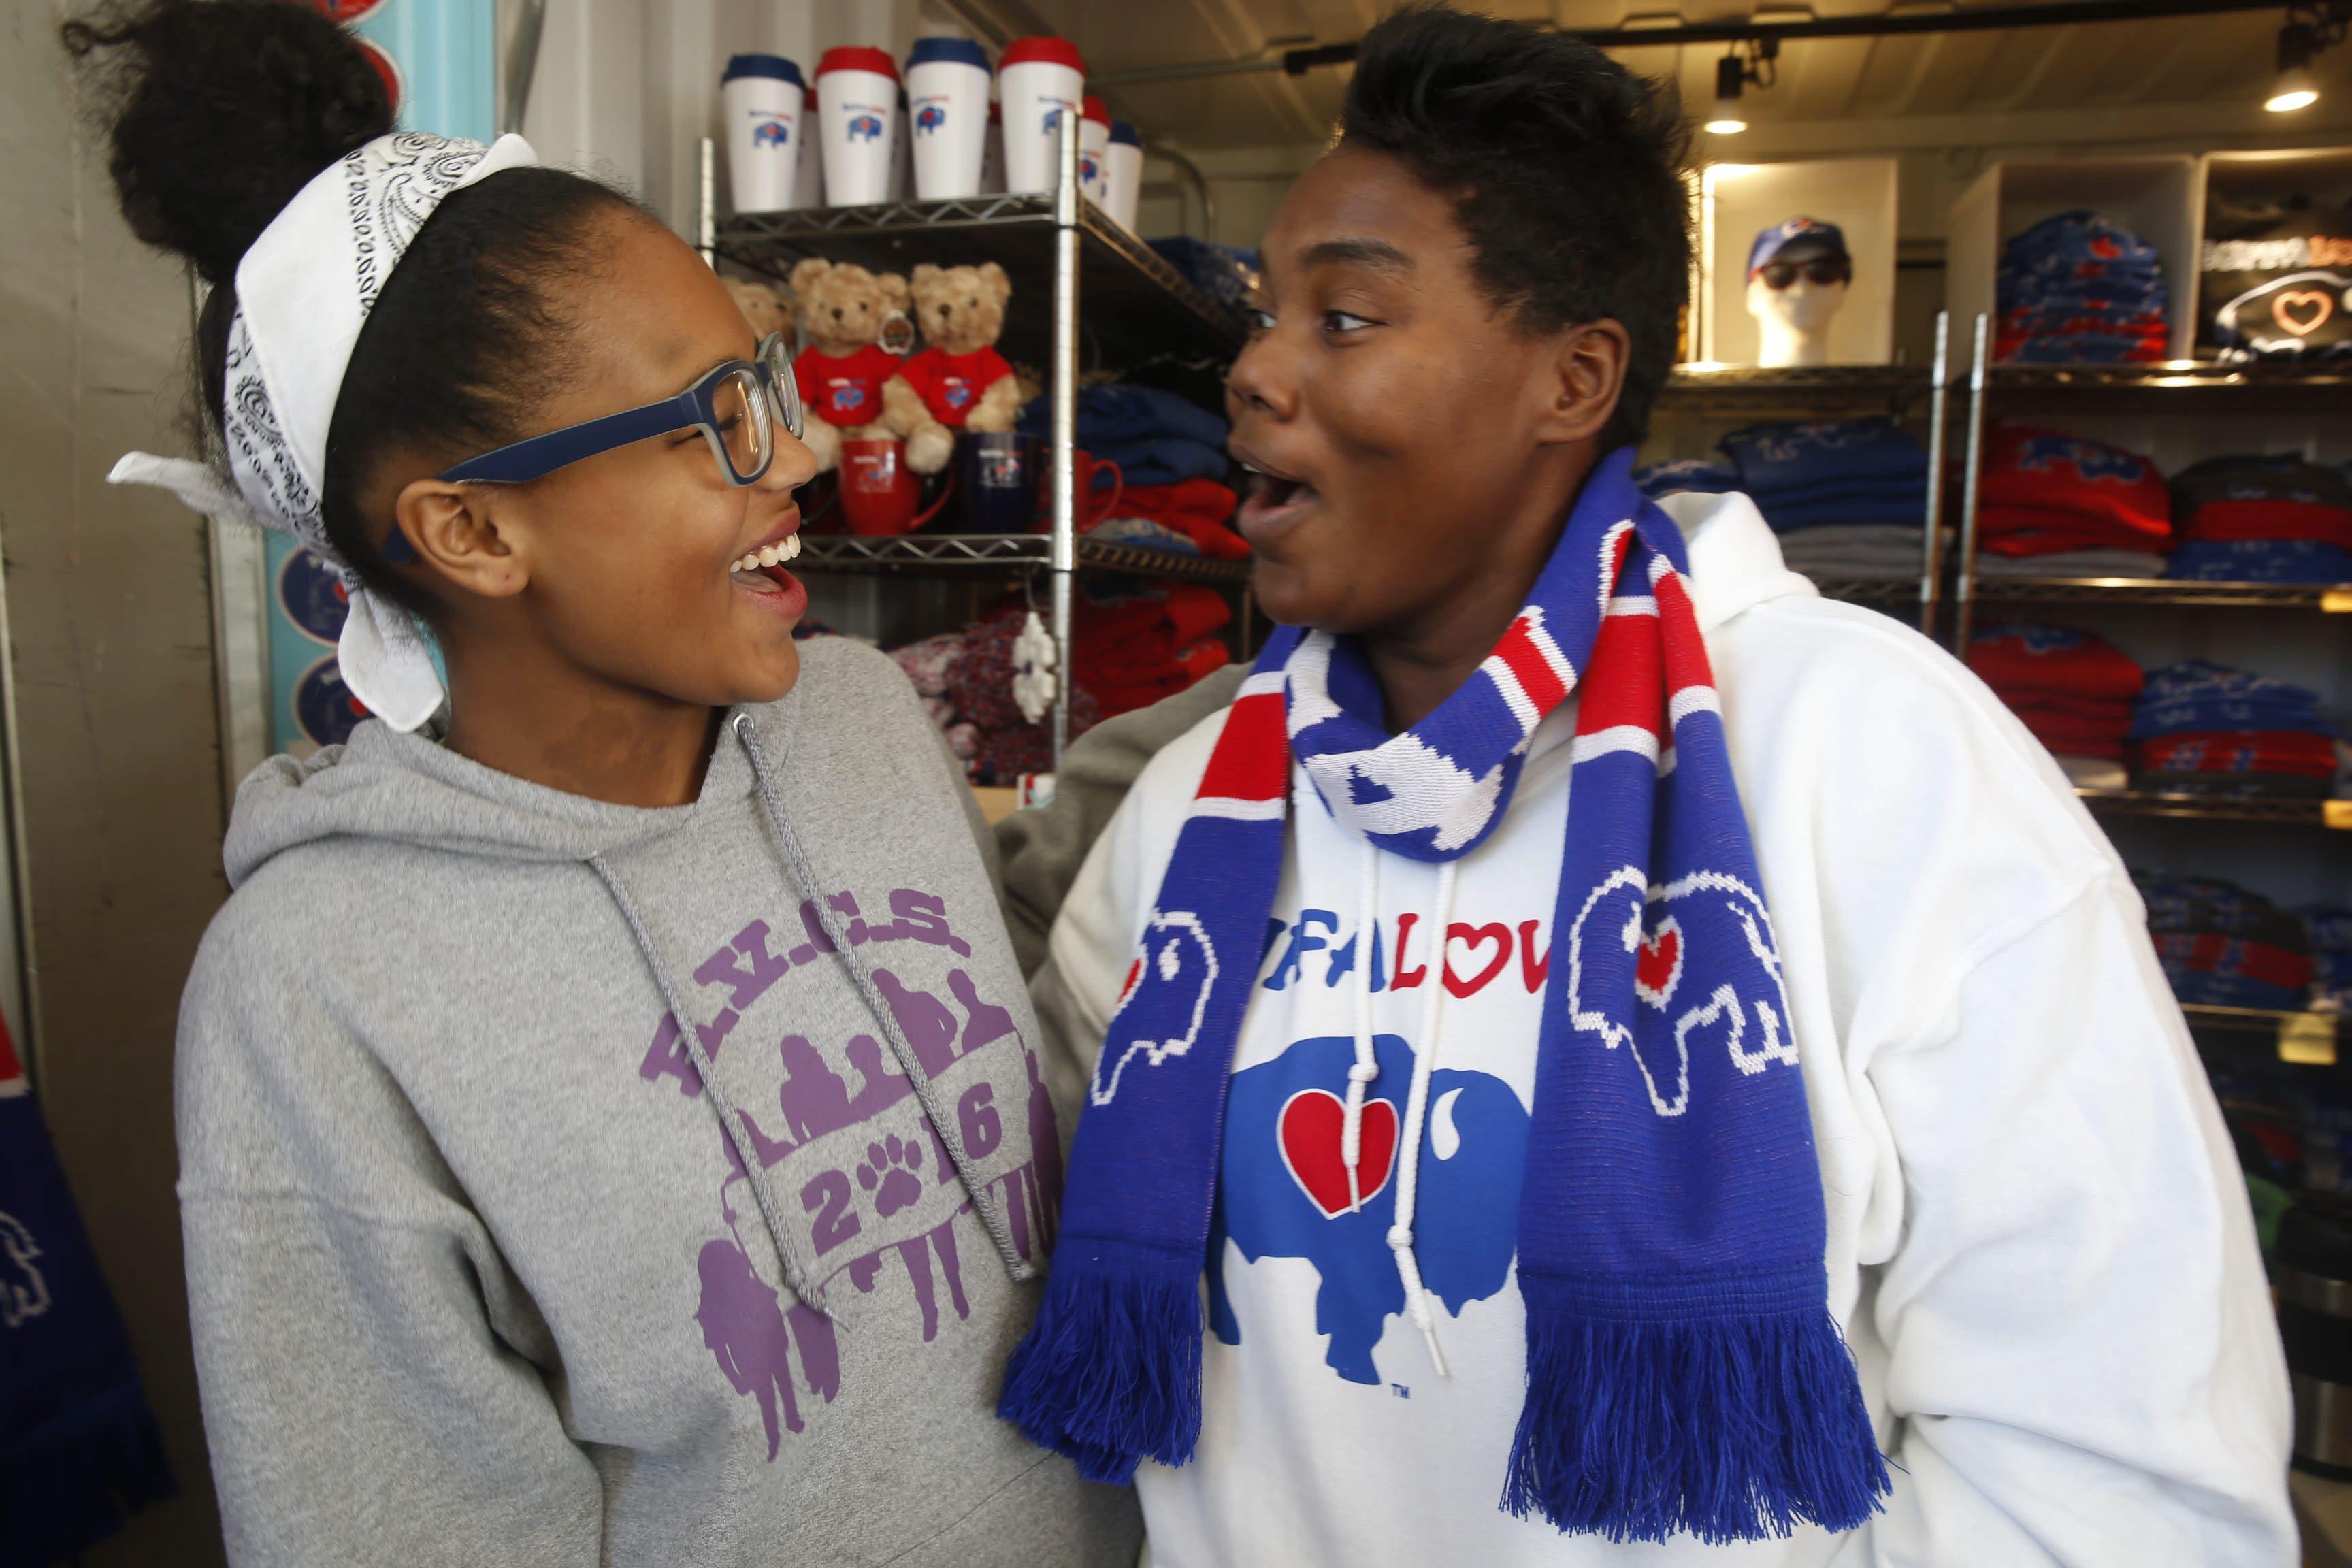 Tkai Smith, 13, and her mom Thais Smith, right, at CanalSide for Tech gadget shopping story. Sunday, Nov. 29, 2015. (Robert Kirkham/Buffalo News)